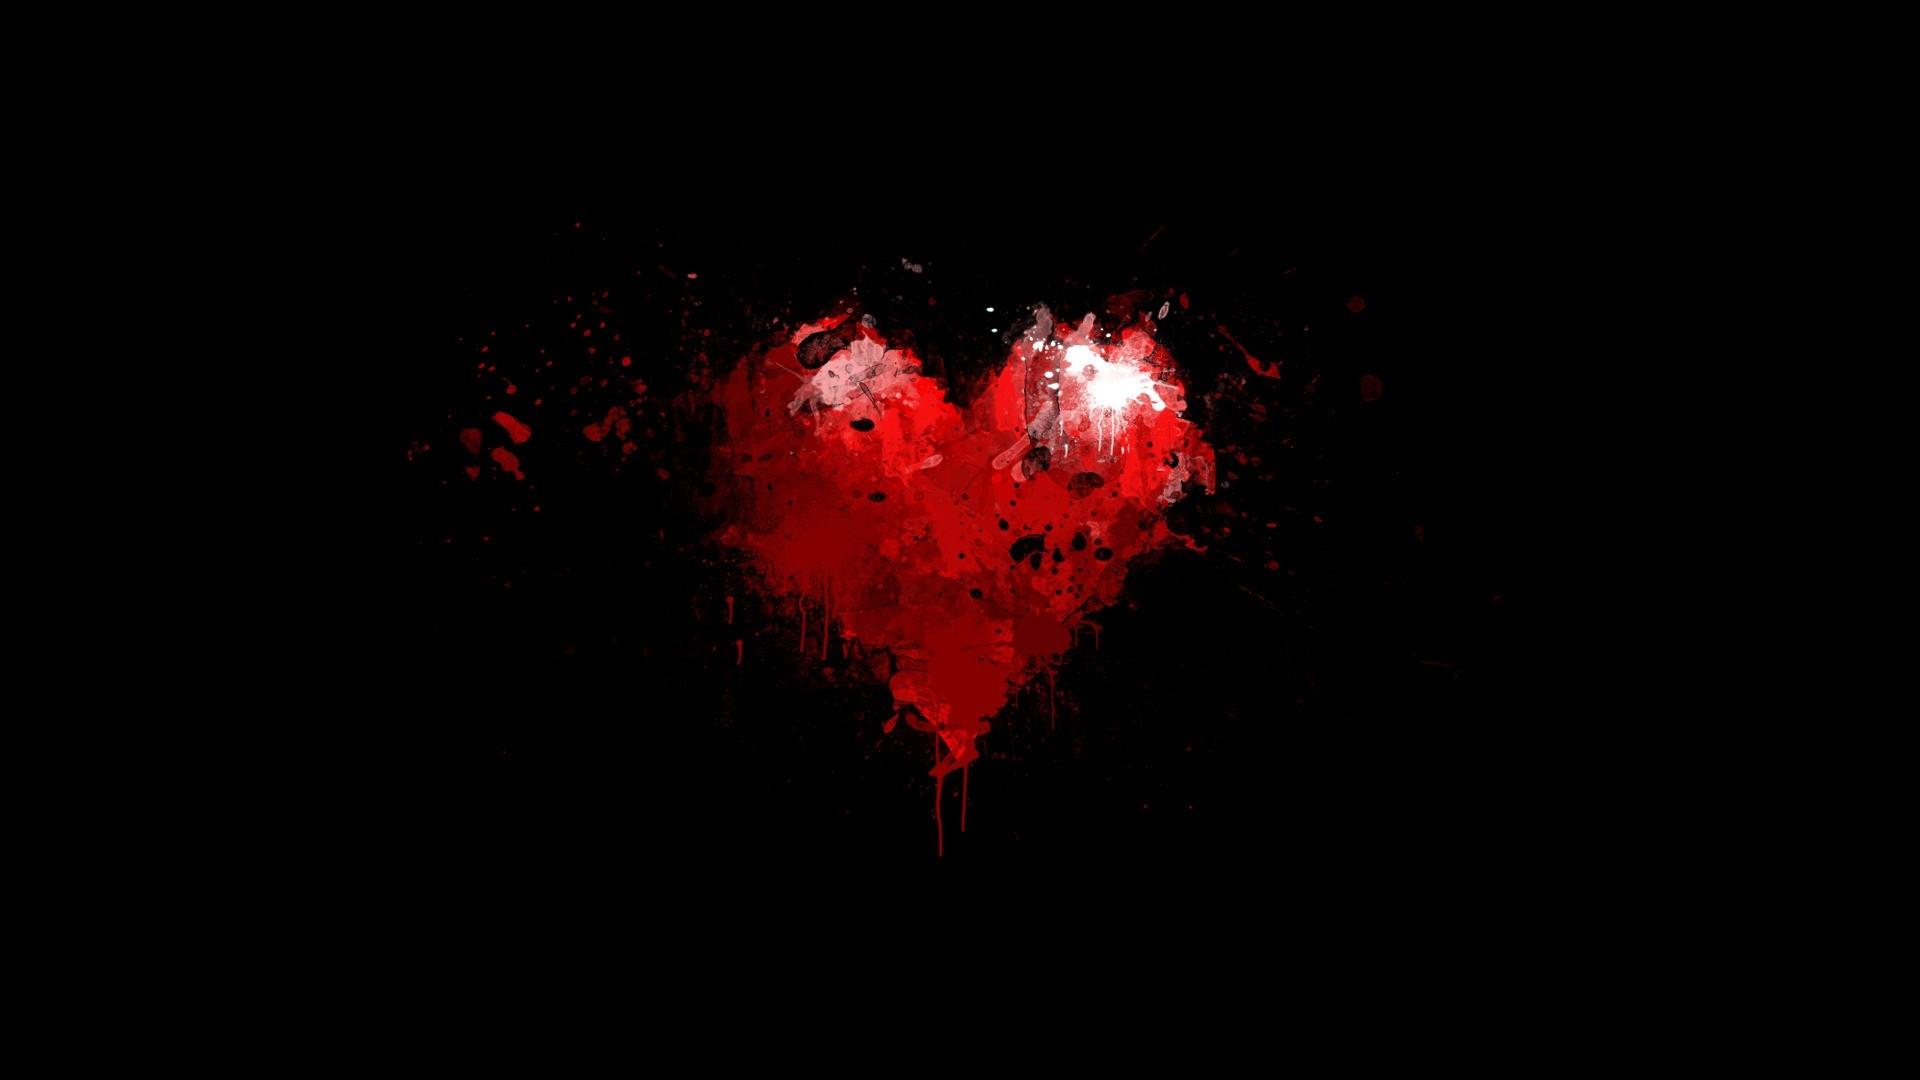 Broken Heart Free Wallpaper